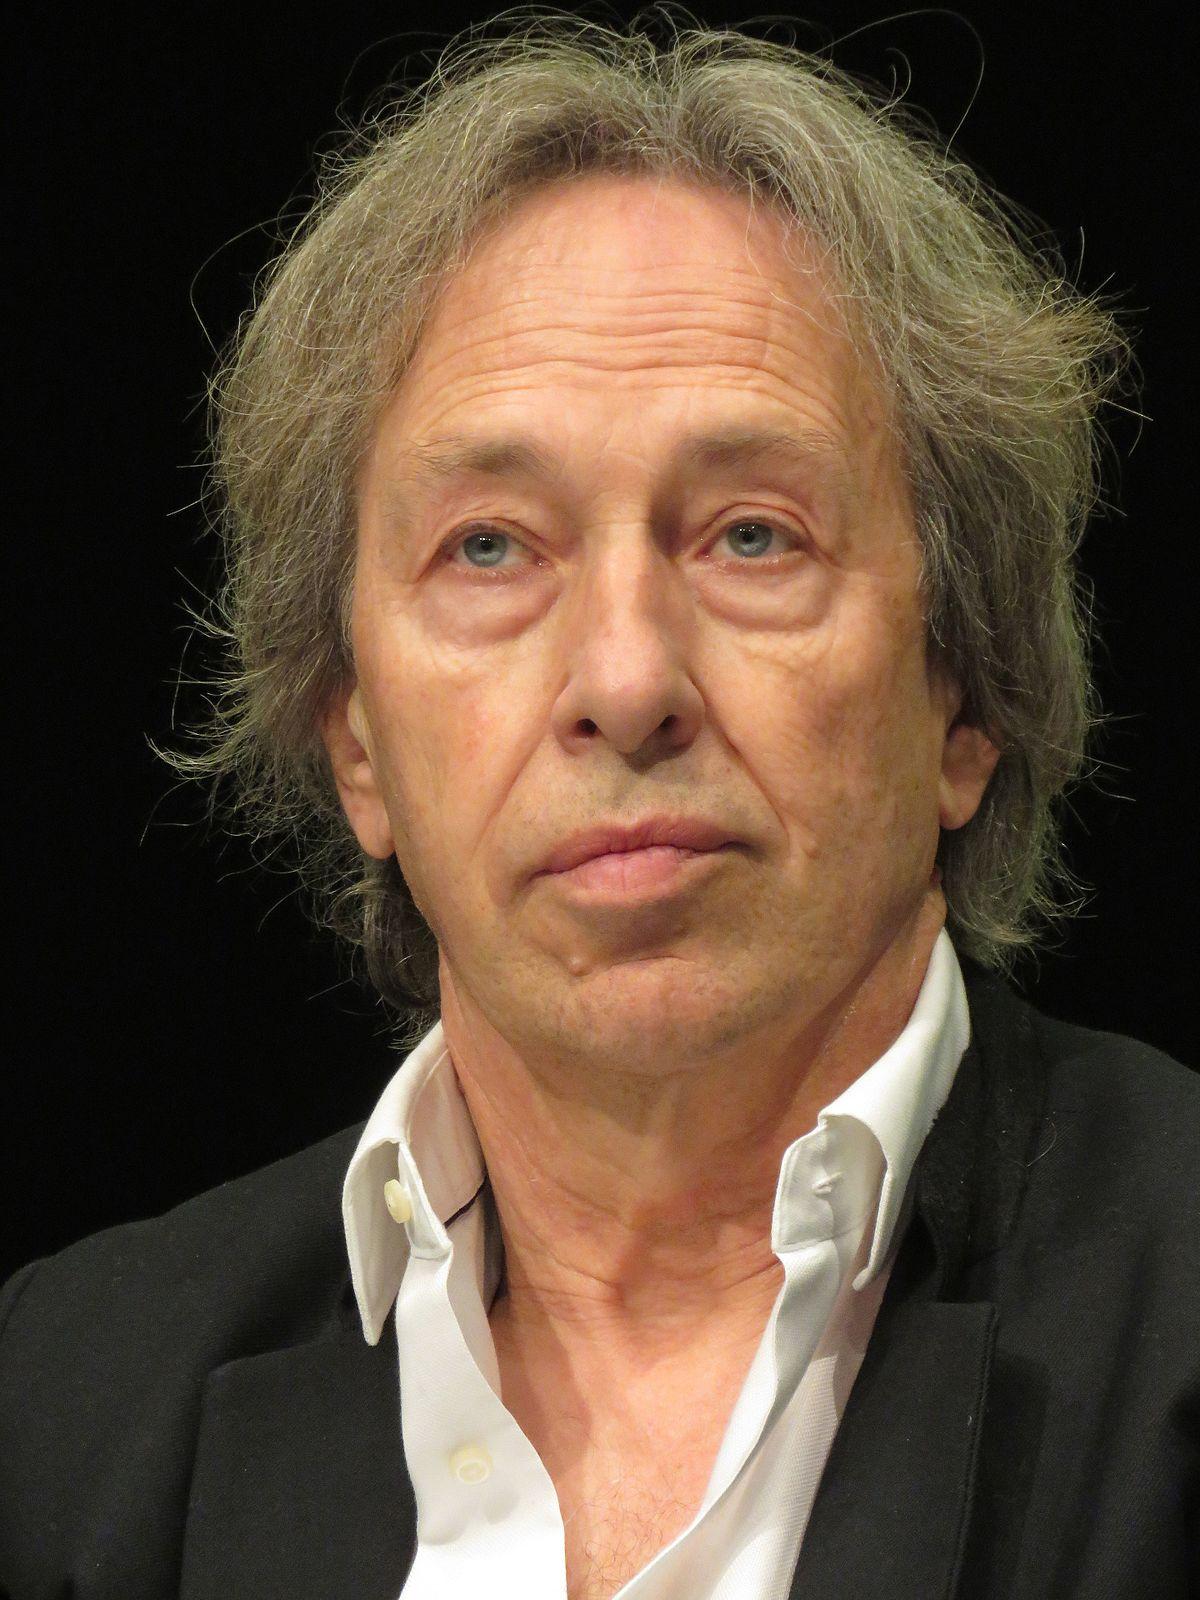 Le Sanglot De L Homme Blanc : sanglot, homme, blanc, Pascal, Bruckner, Wikipedia